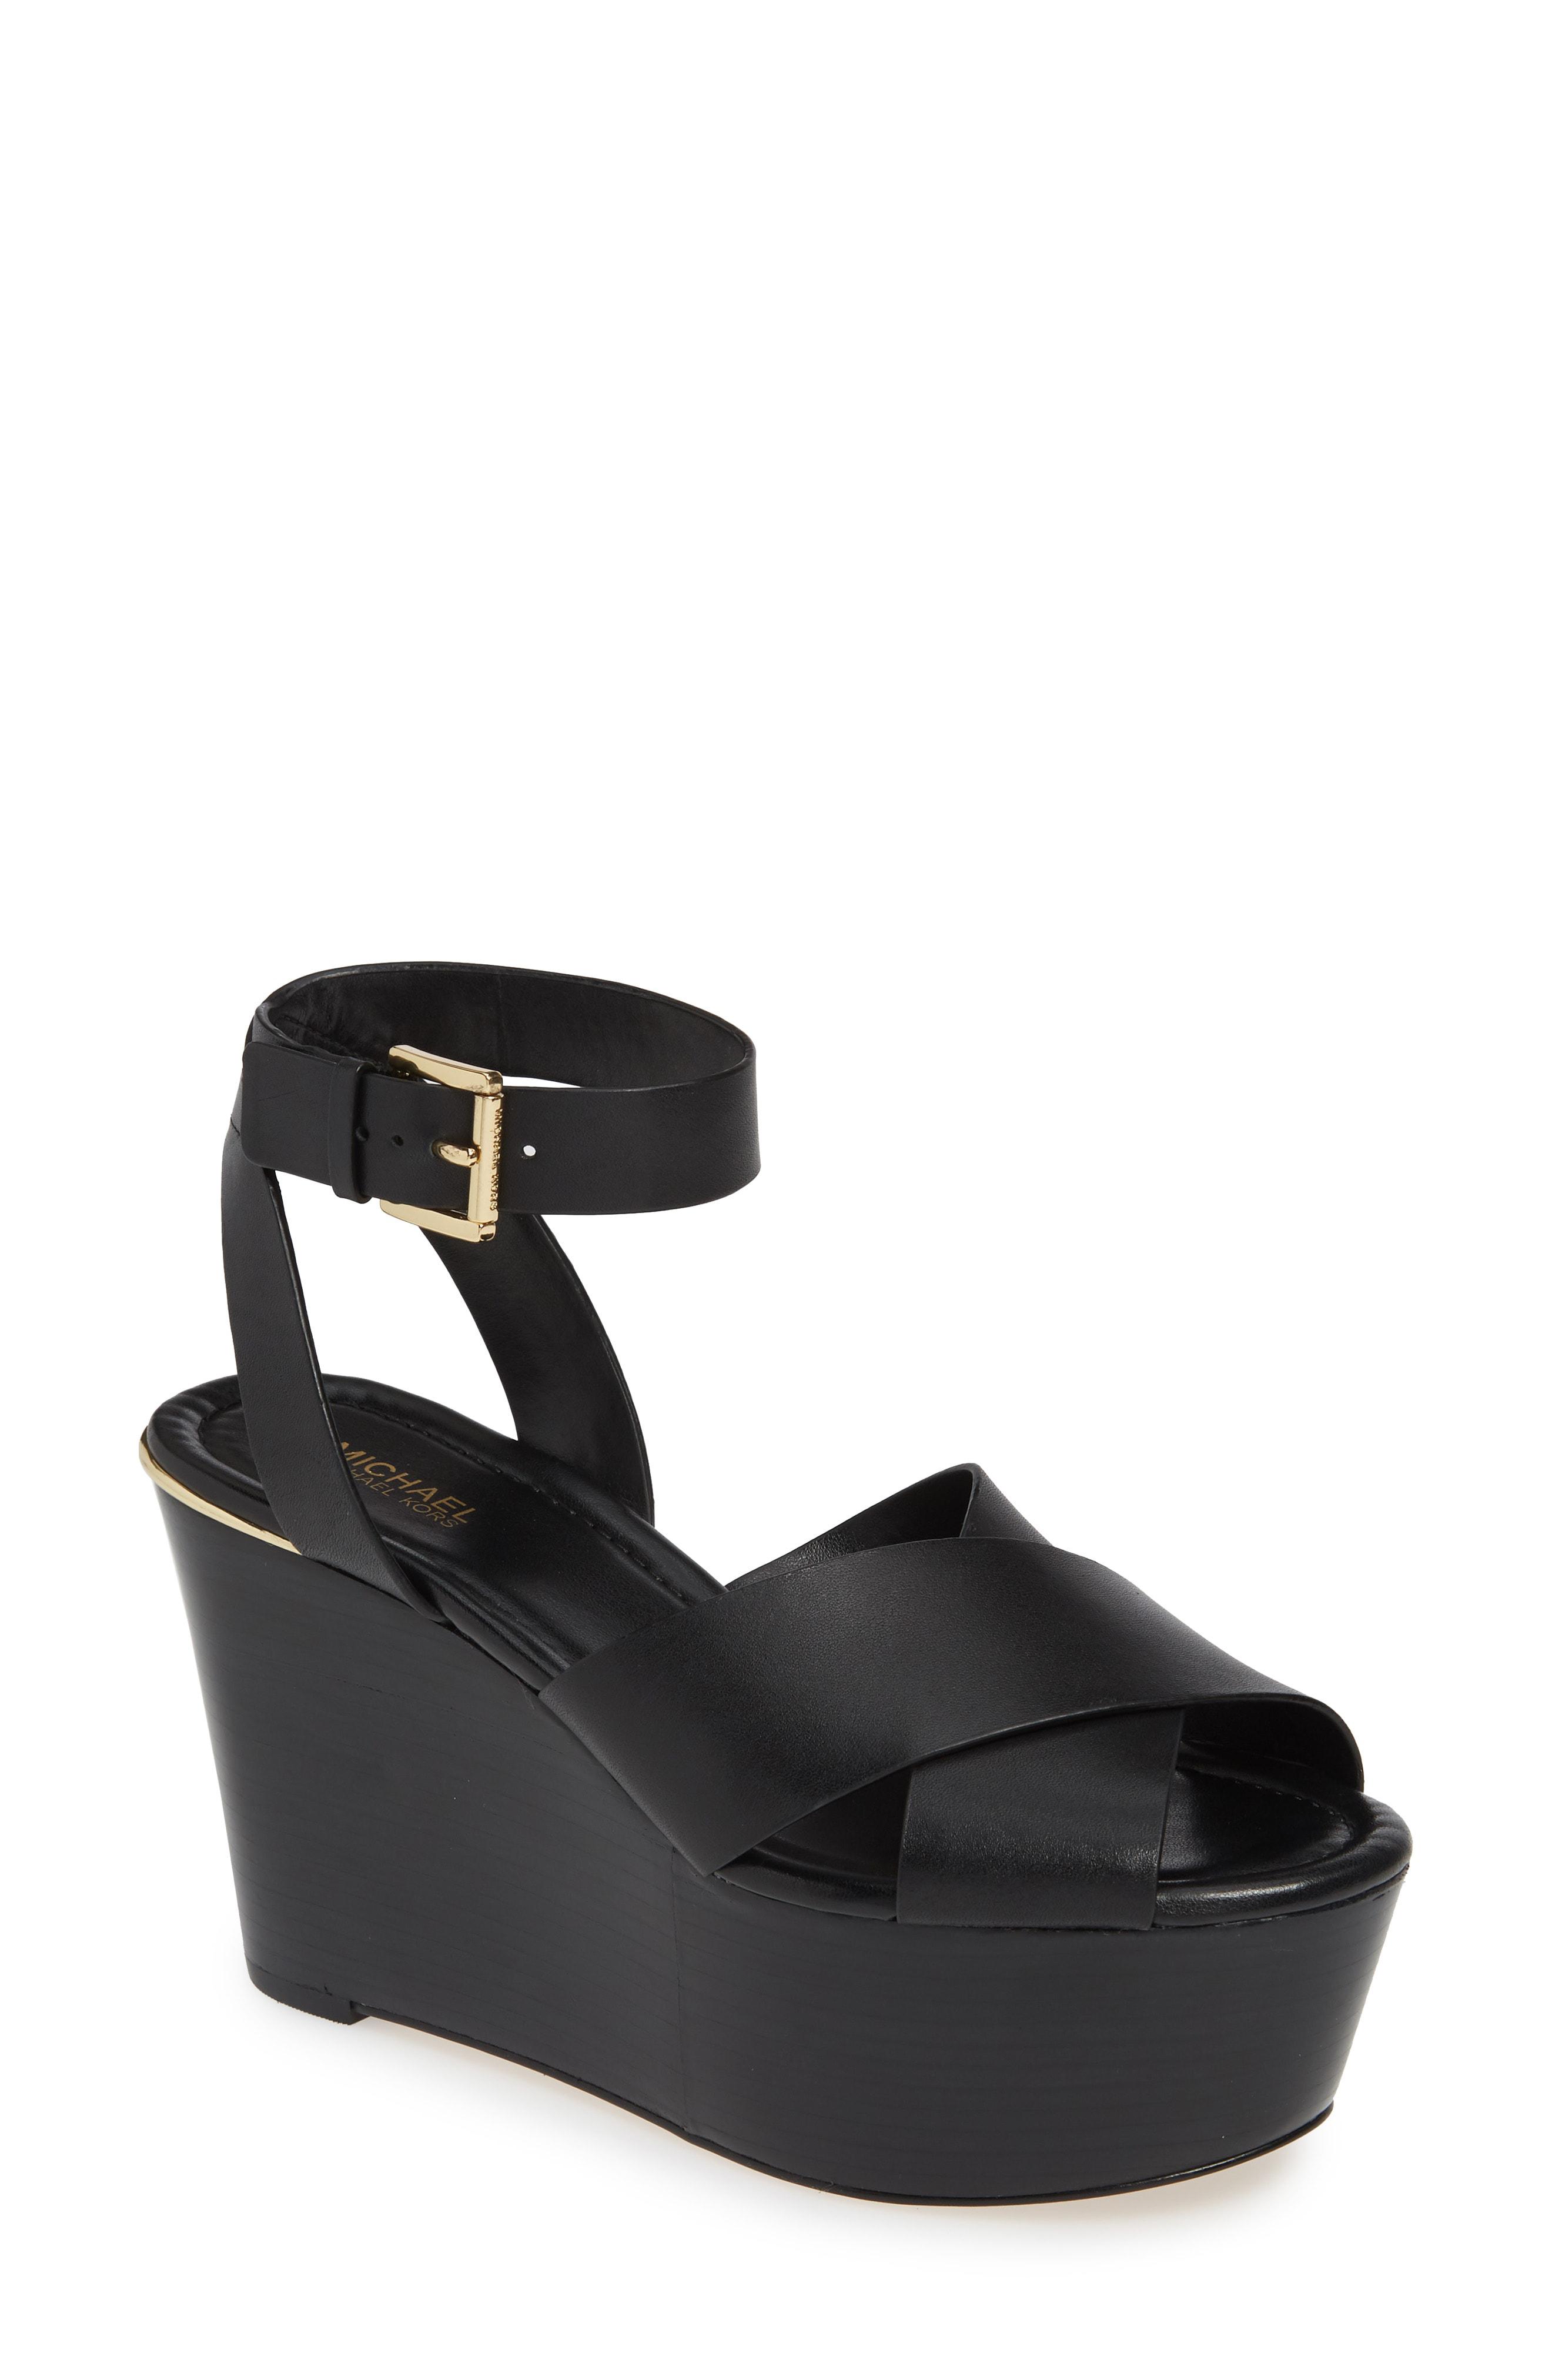 b389392f556ad Style Name  Michael Michael Kors Abbott Platform Wedge Sandal (Women).  Style Number  5771149.